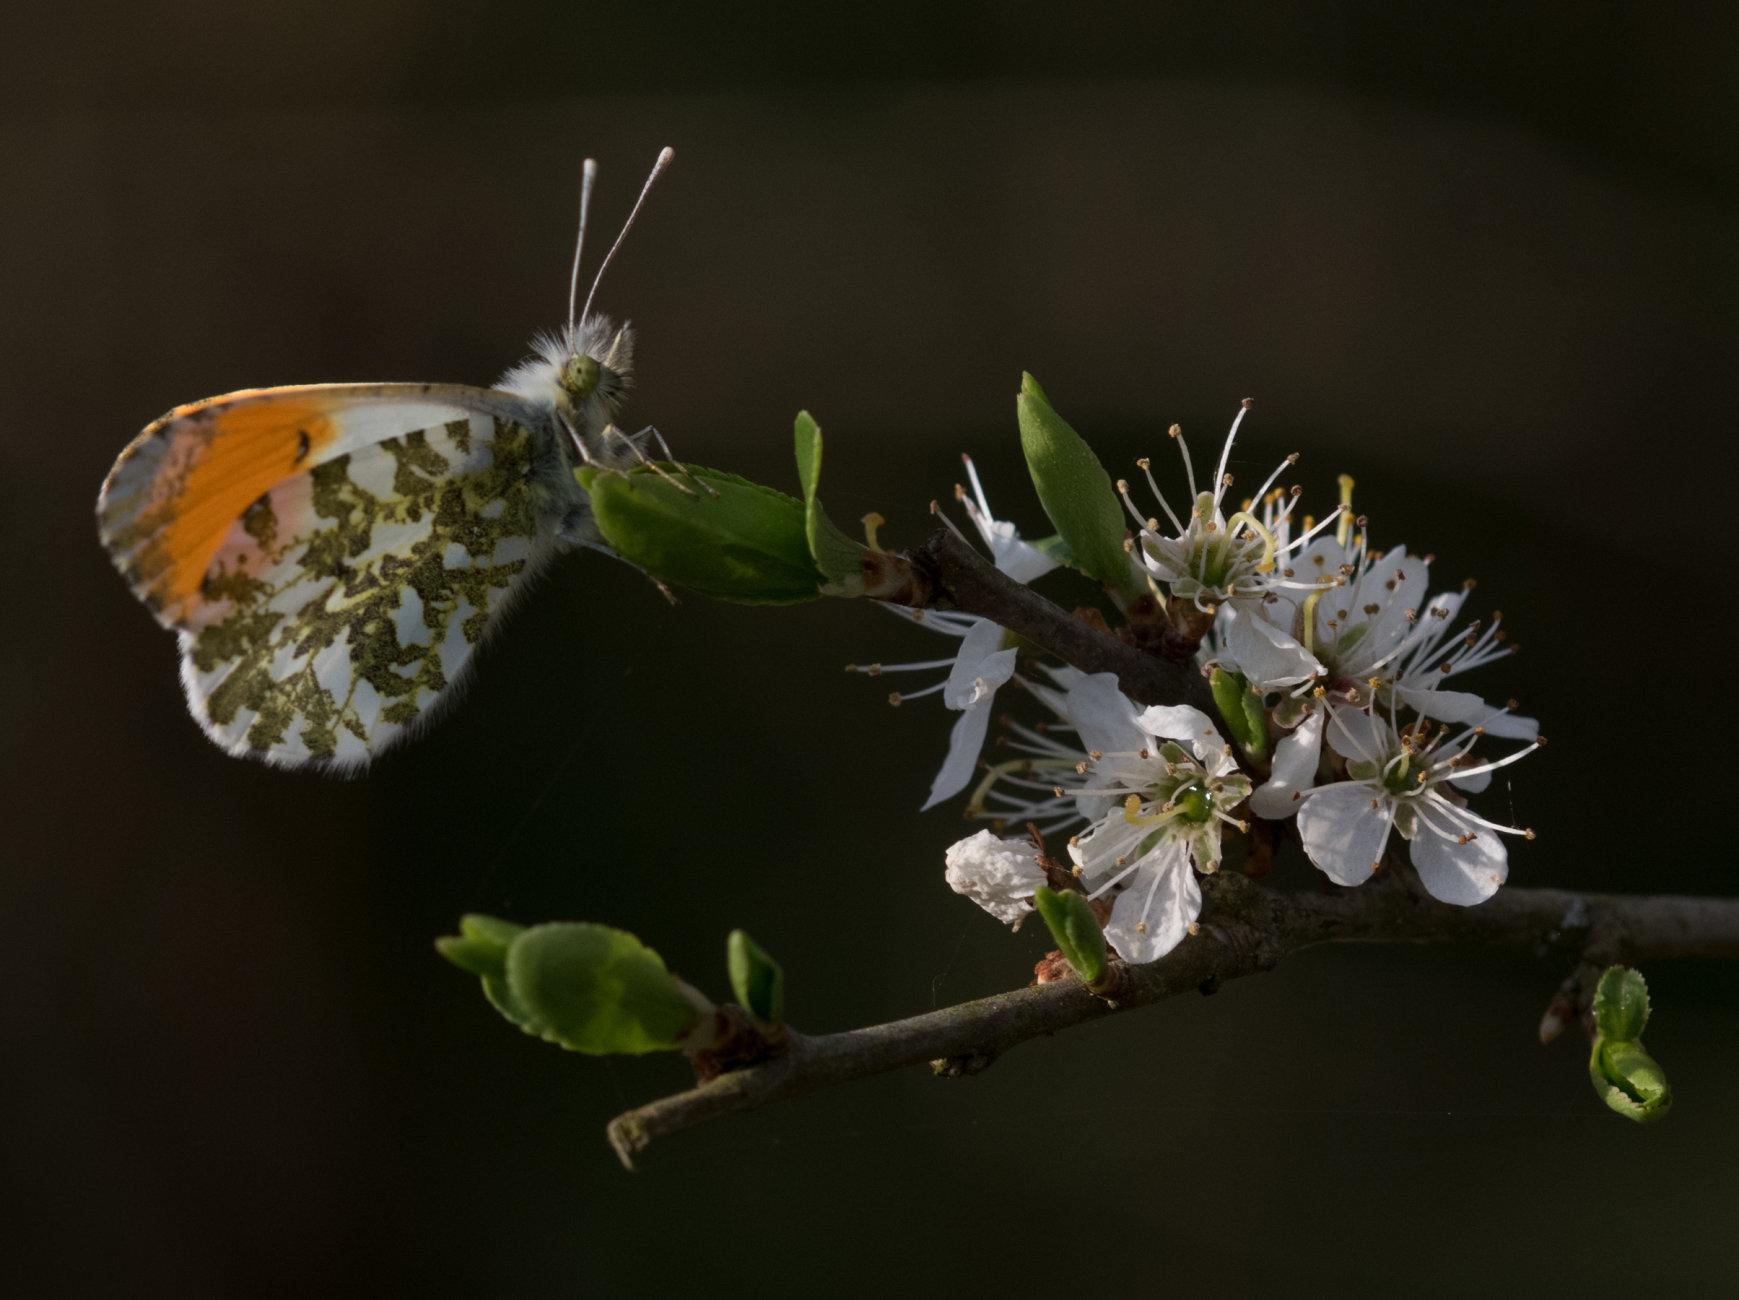 Male orangetip on blackthorn blossom